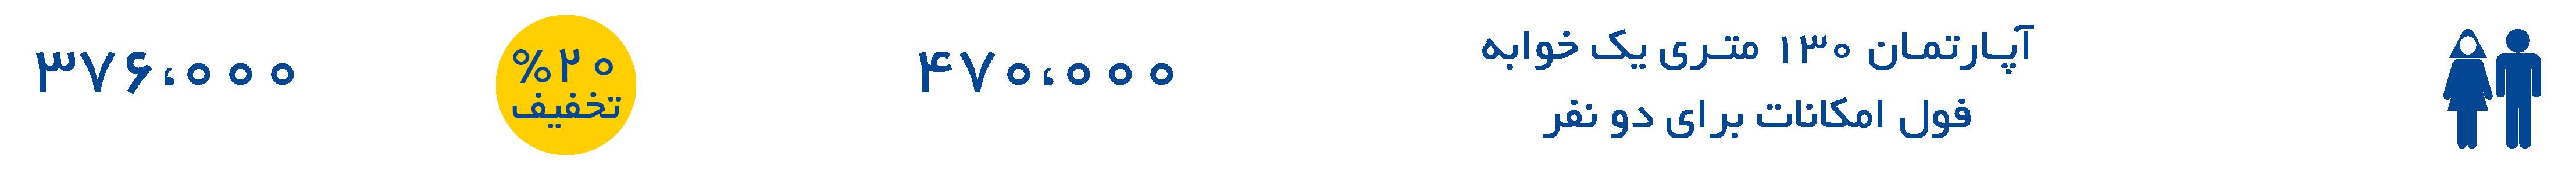 02-person-saran